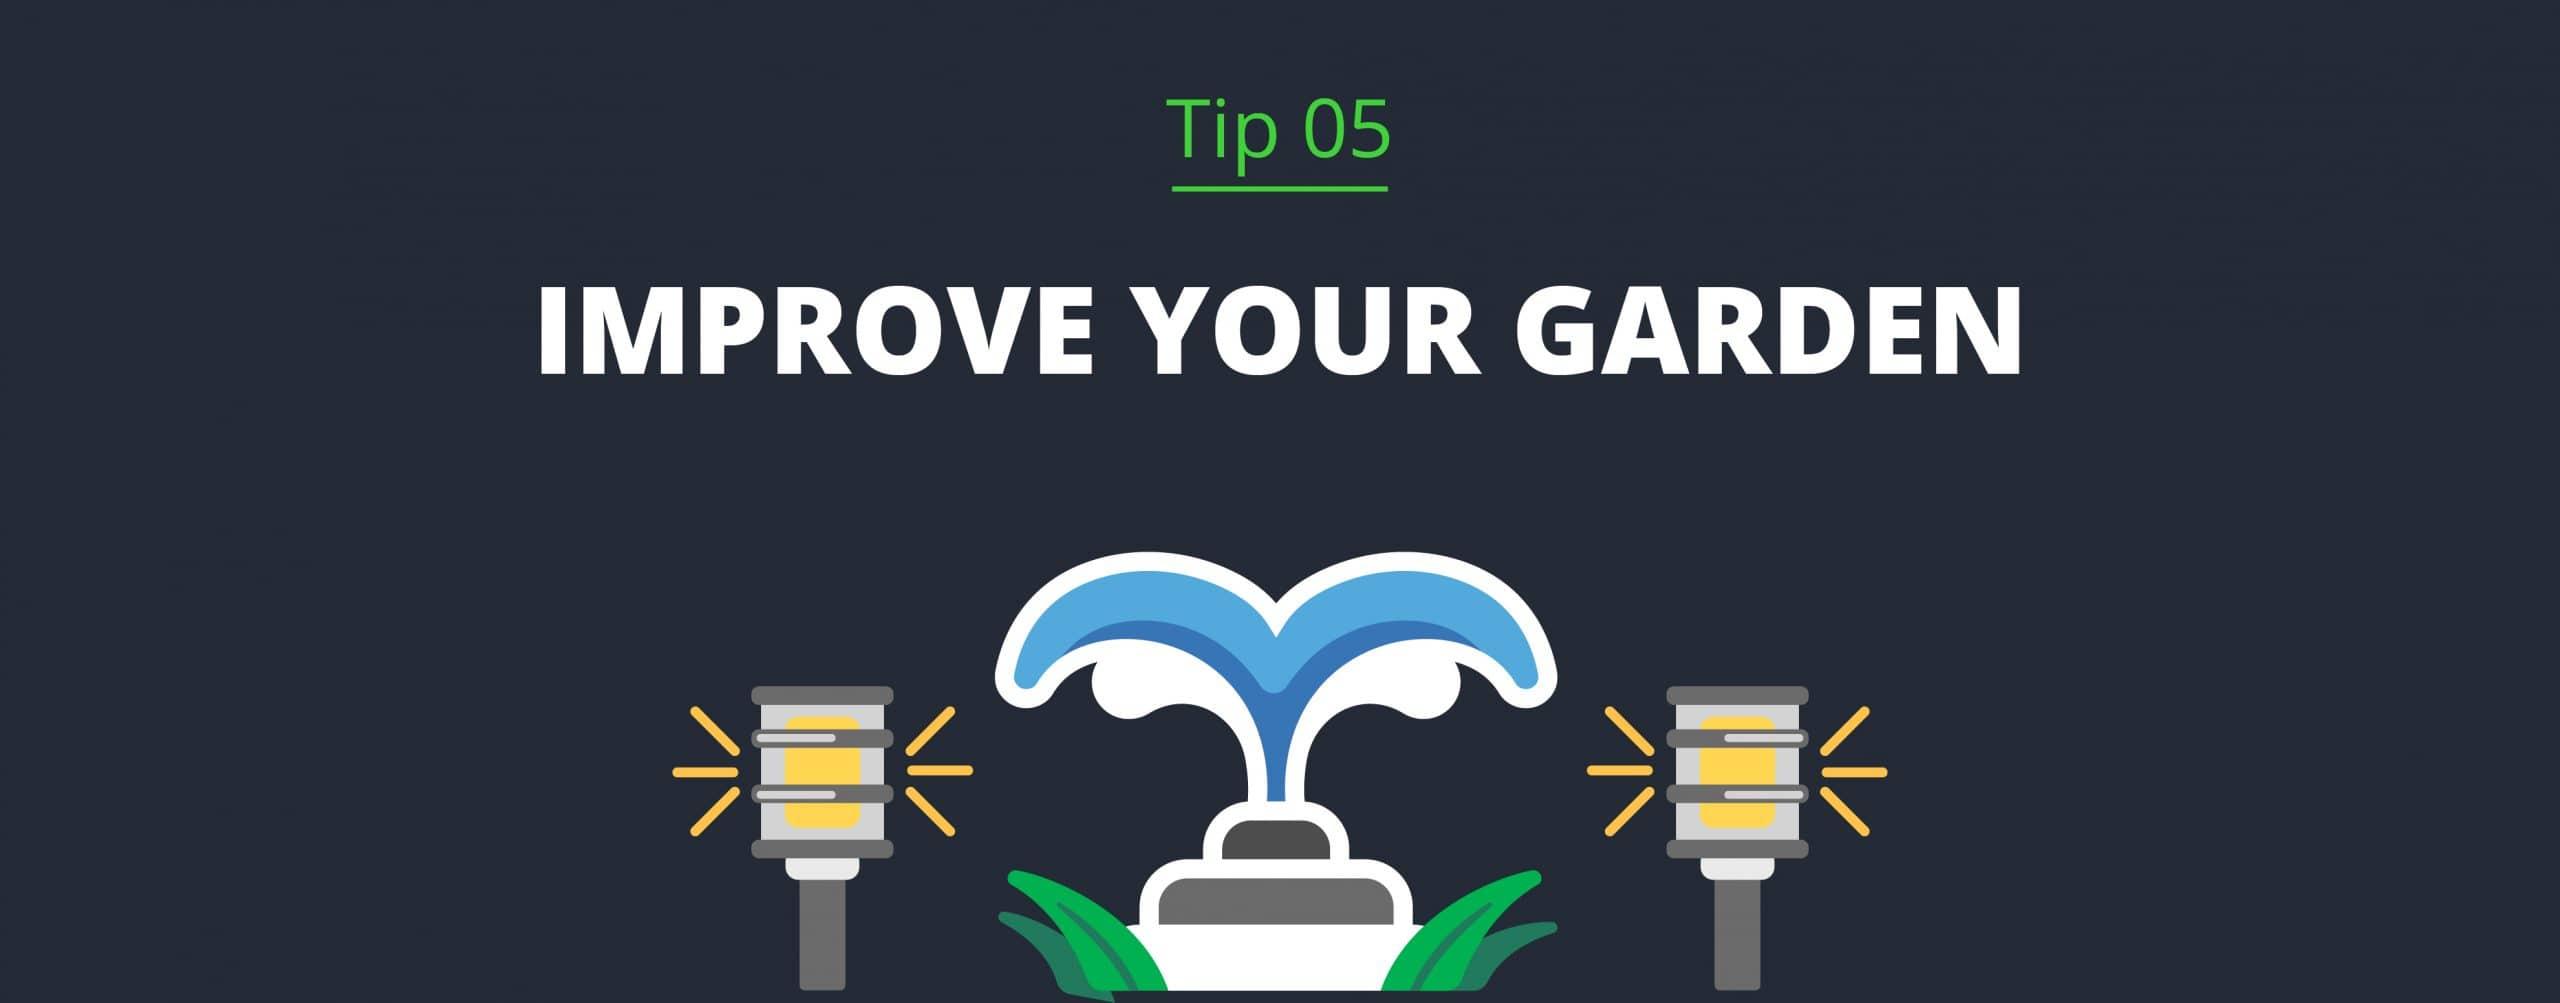 Arb Garden Guide Headings-05